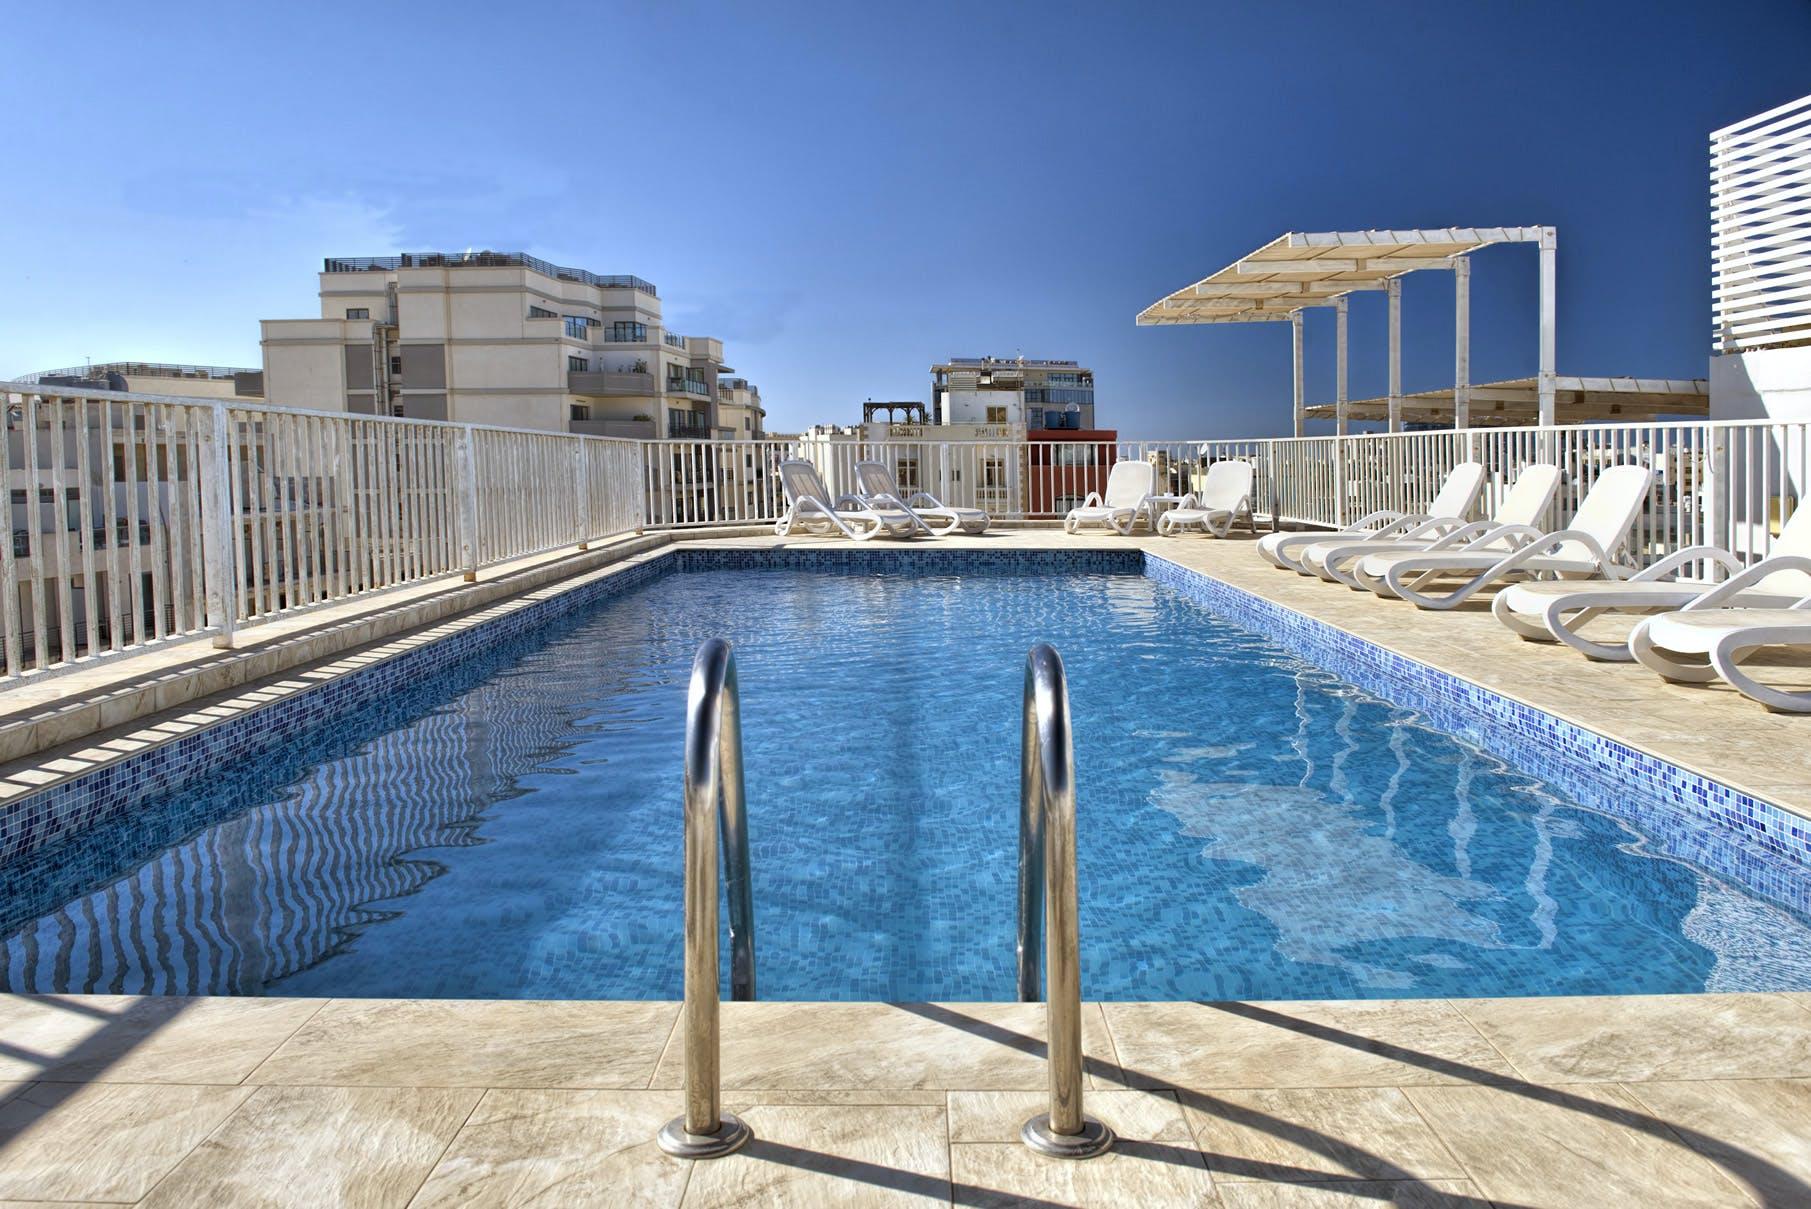 Hotel Argento  pool